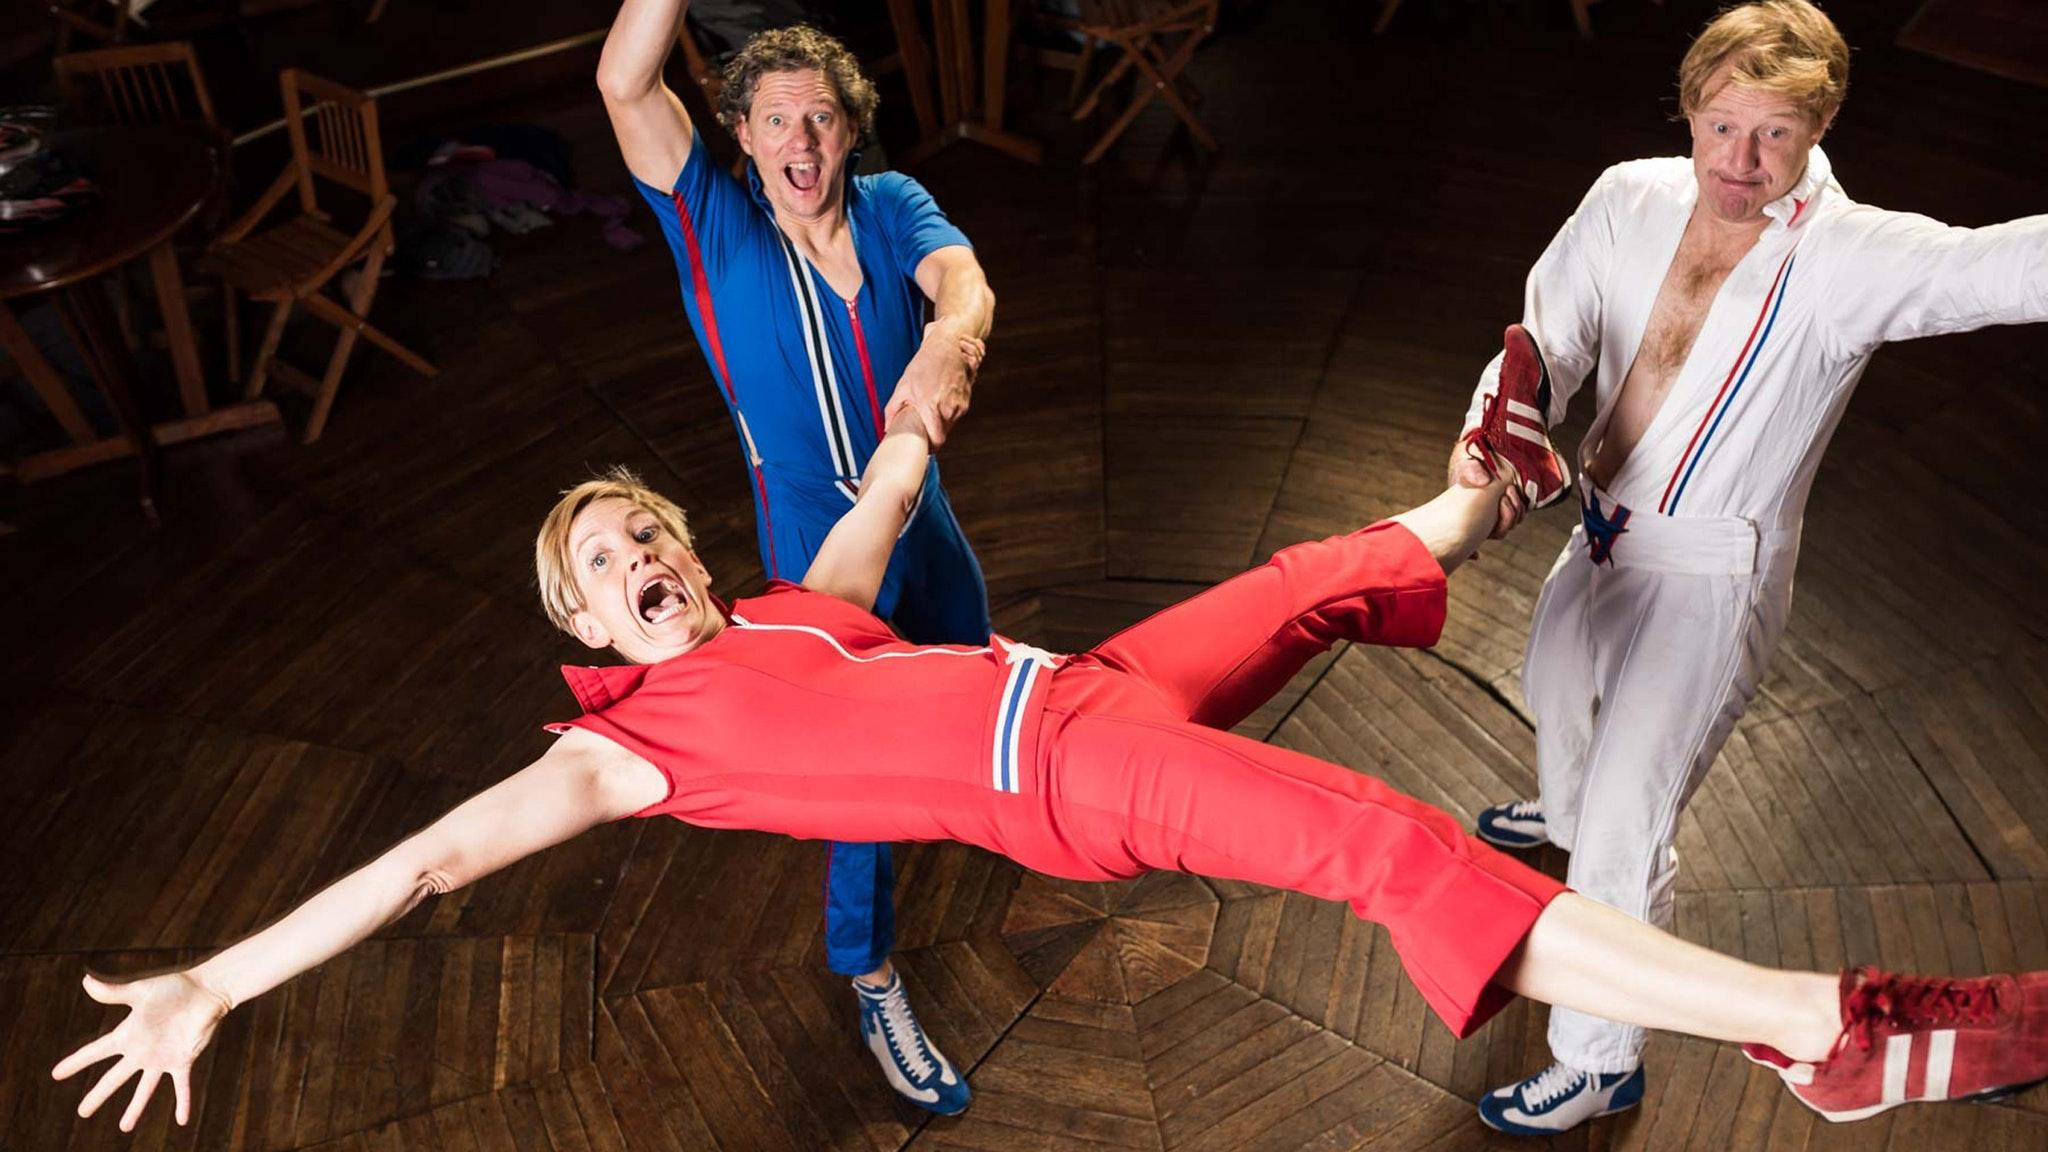 Image: Circus Oz 2016 presents 3 Speed Crunch Box Performers: Kate Fryer, Geoffrey Dunstan and Luke